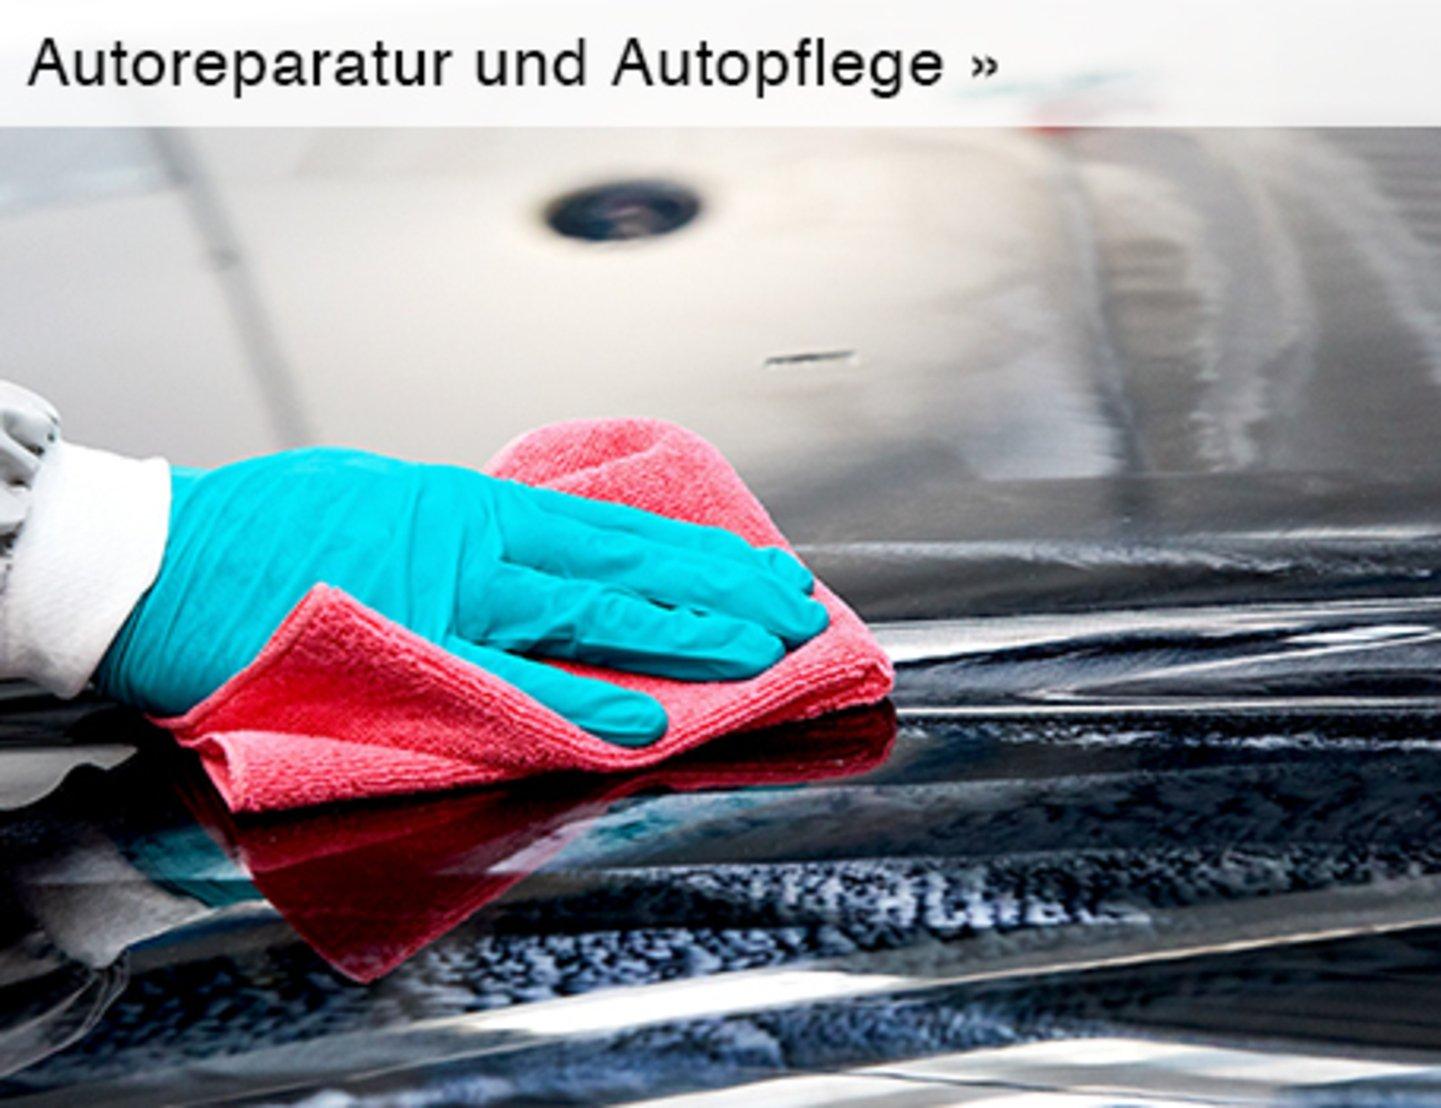 Autoreparatur und Autopflege